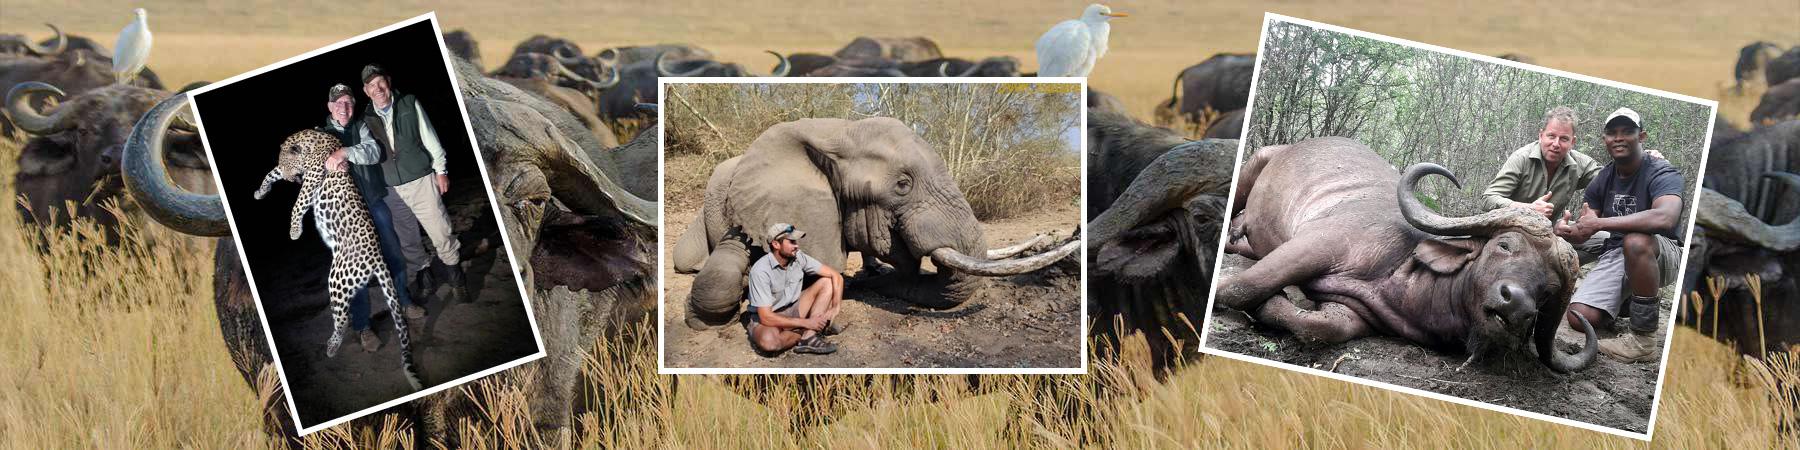 Home-page-leopard-elephant-buffalo-banner-2